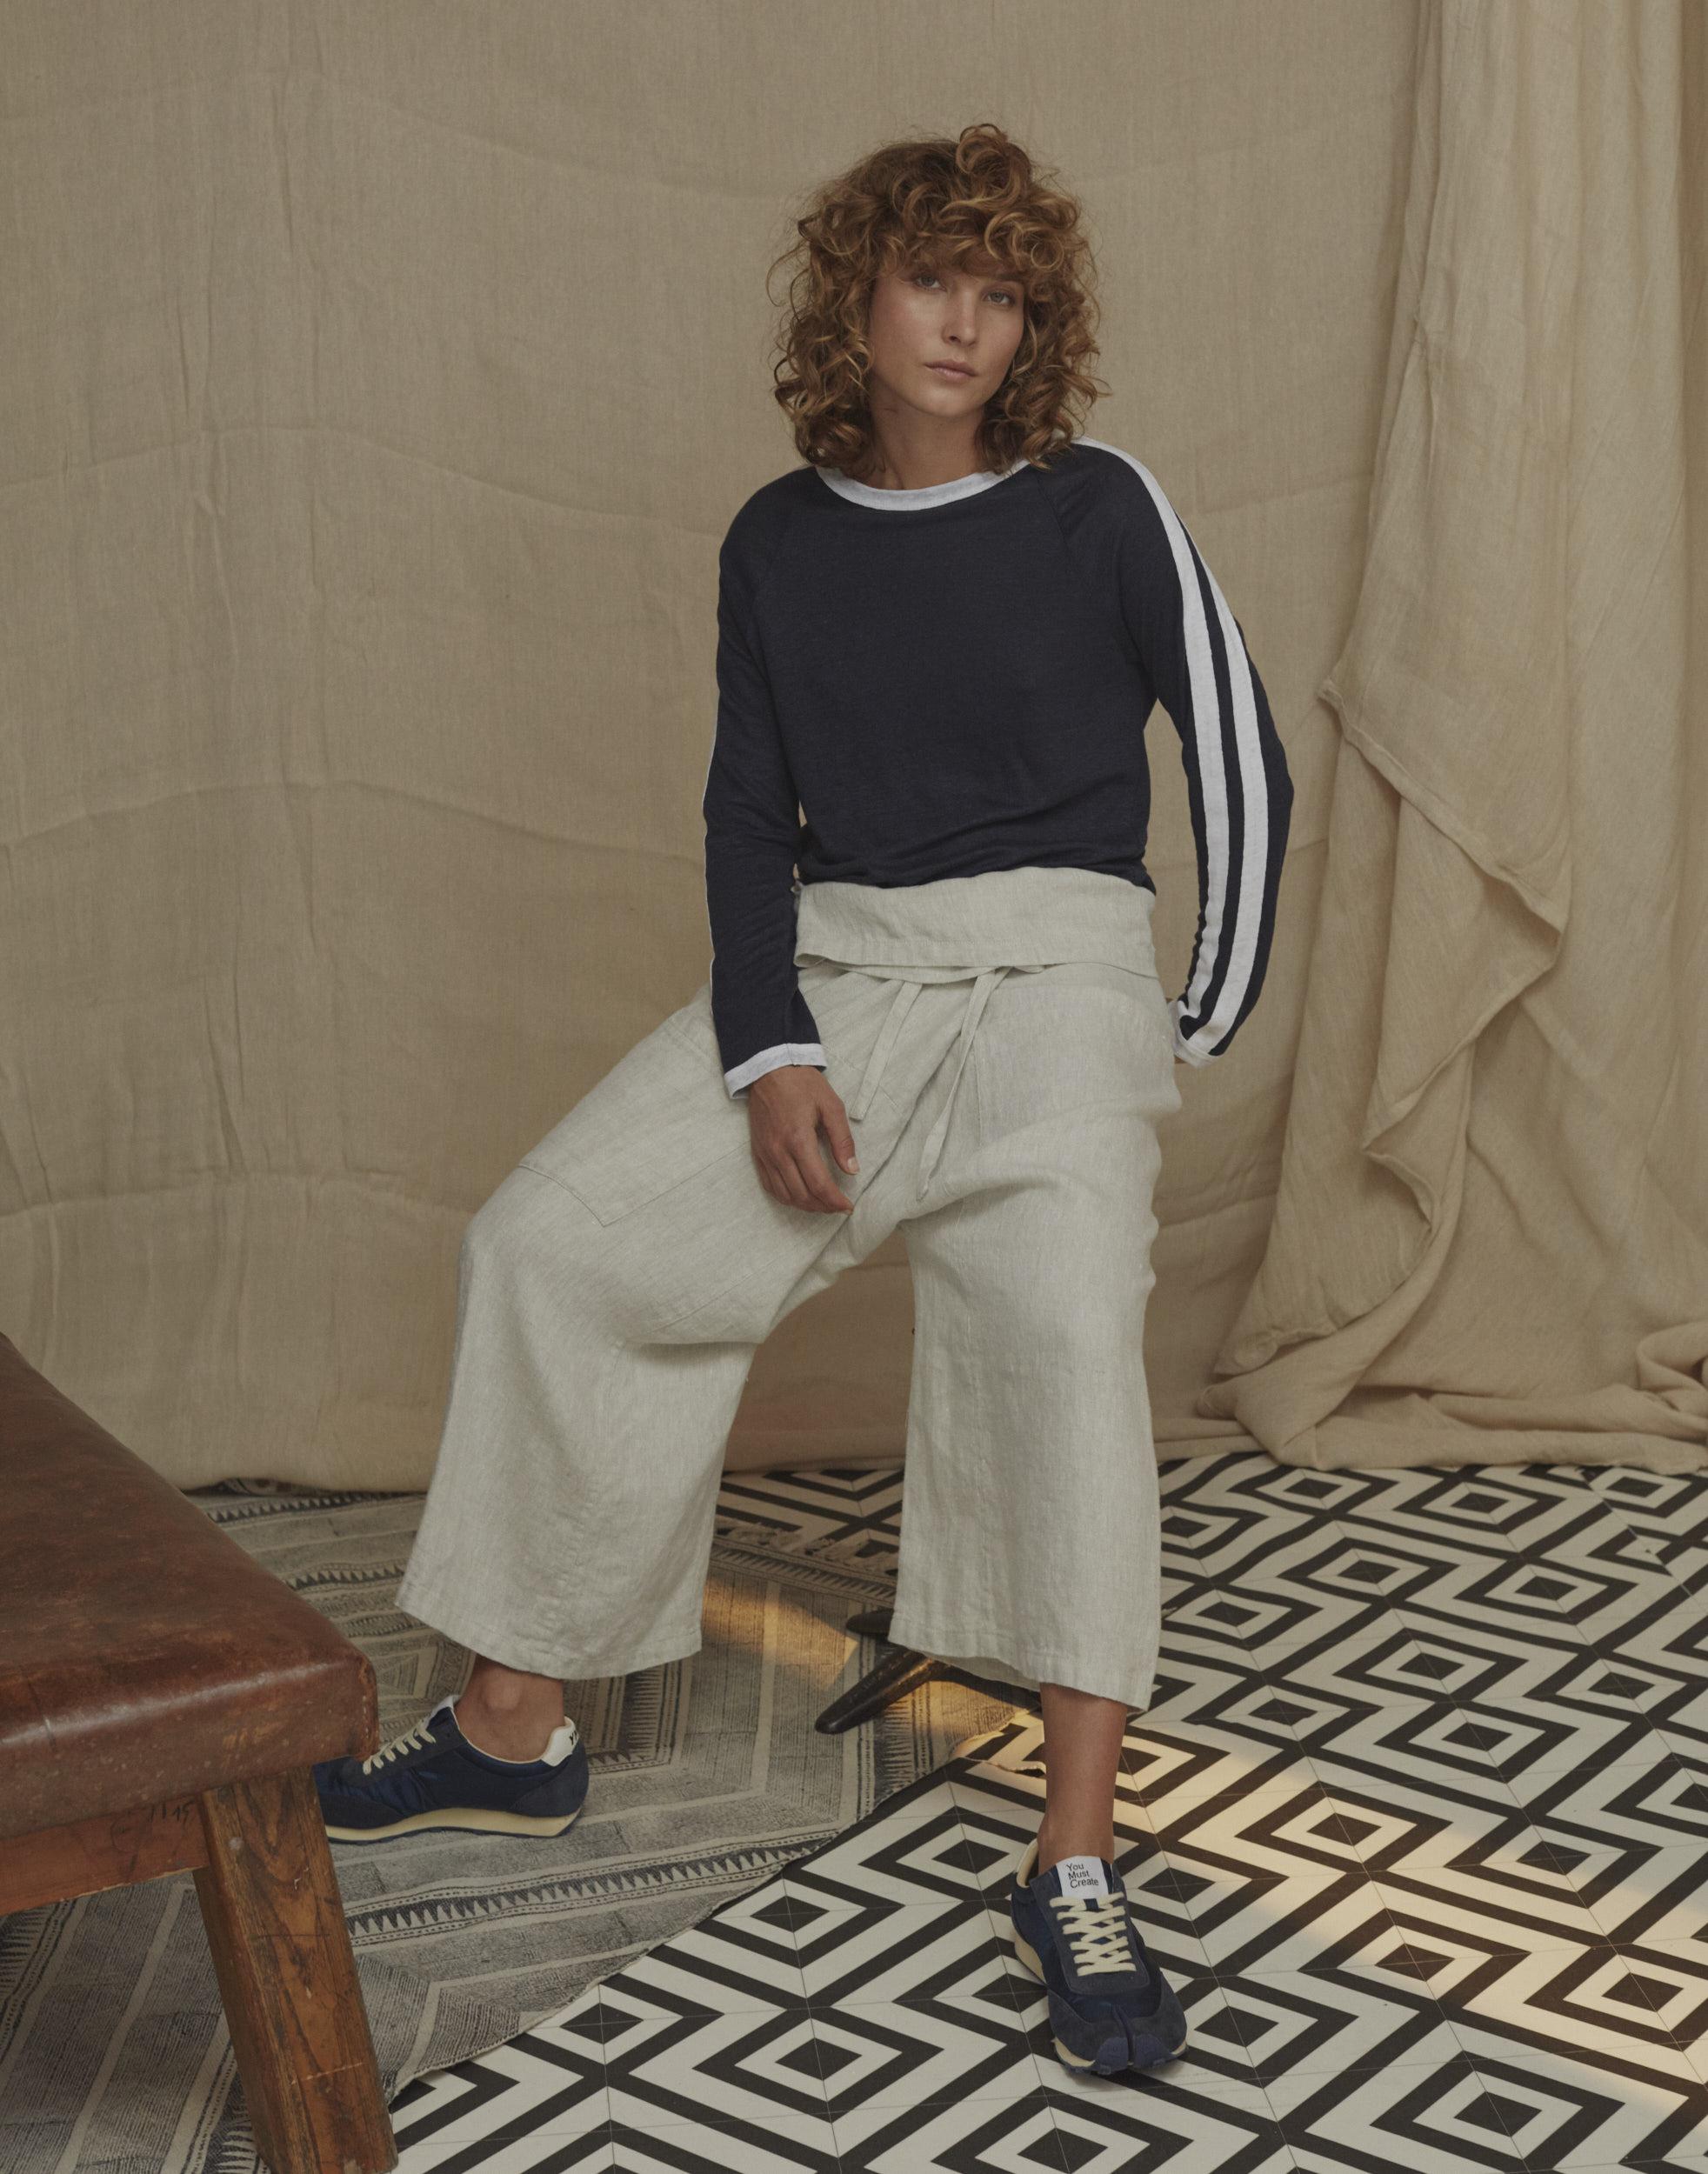 ymc-ss17-collection-okoro-women-fashion-folkr-9